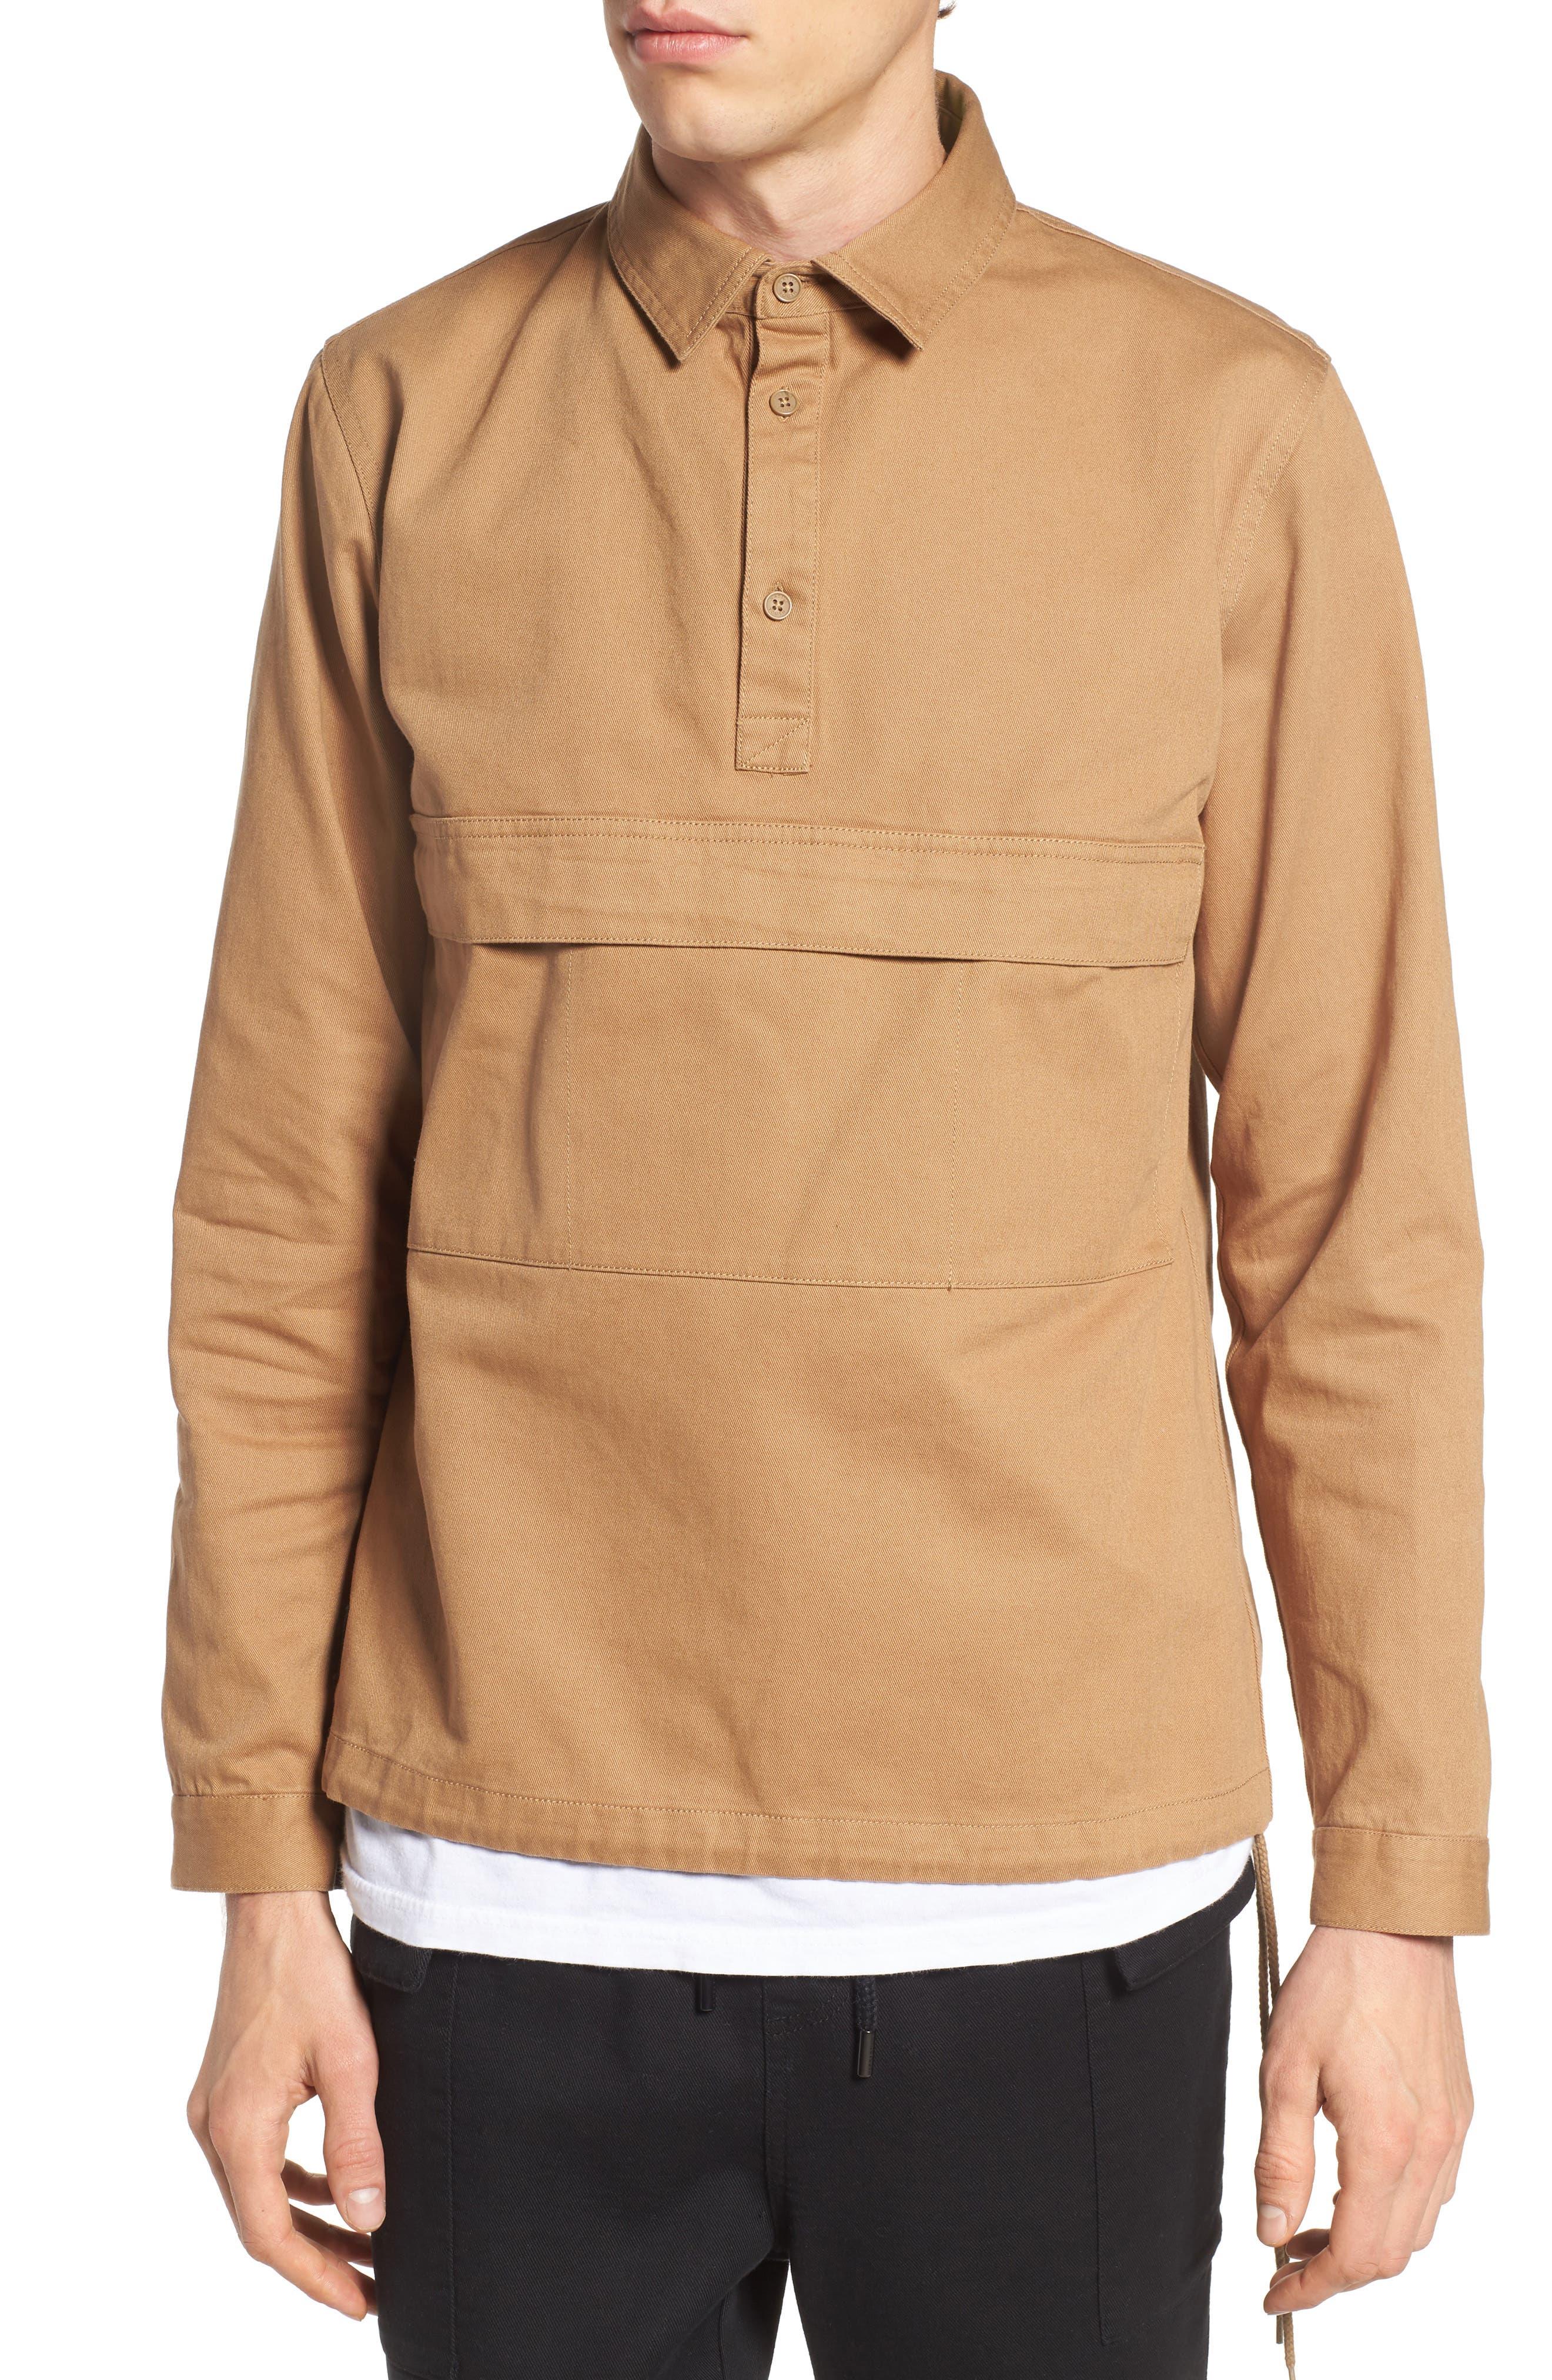 Woodside Twill Shirt,                             Main thumbnail 1, color,                             Sand